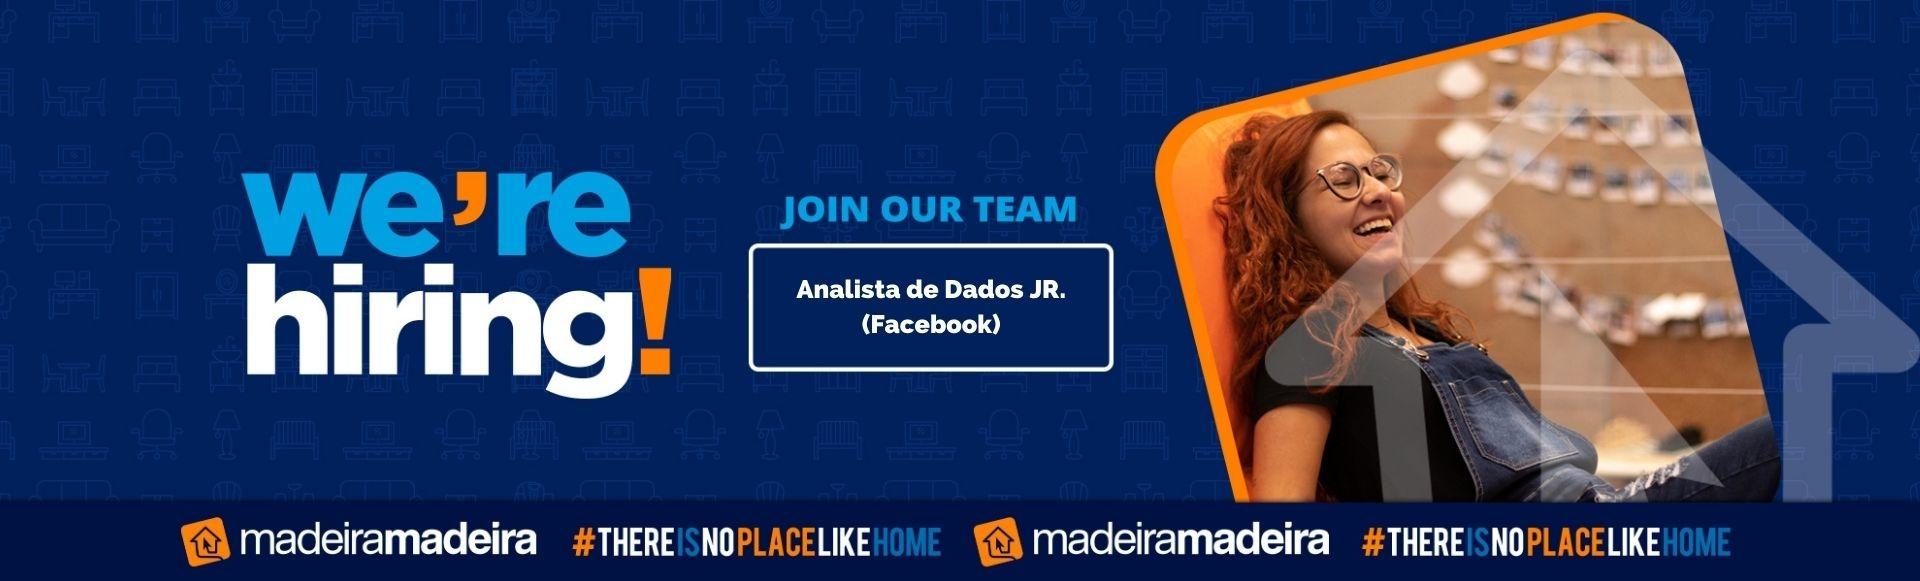 Analista de Marketing e Performance JR (Facebook)